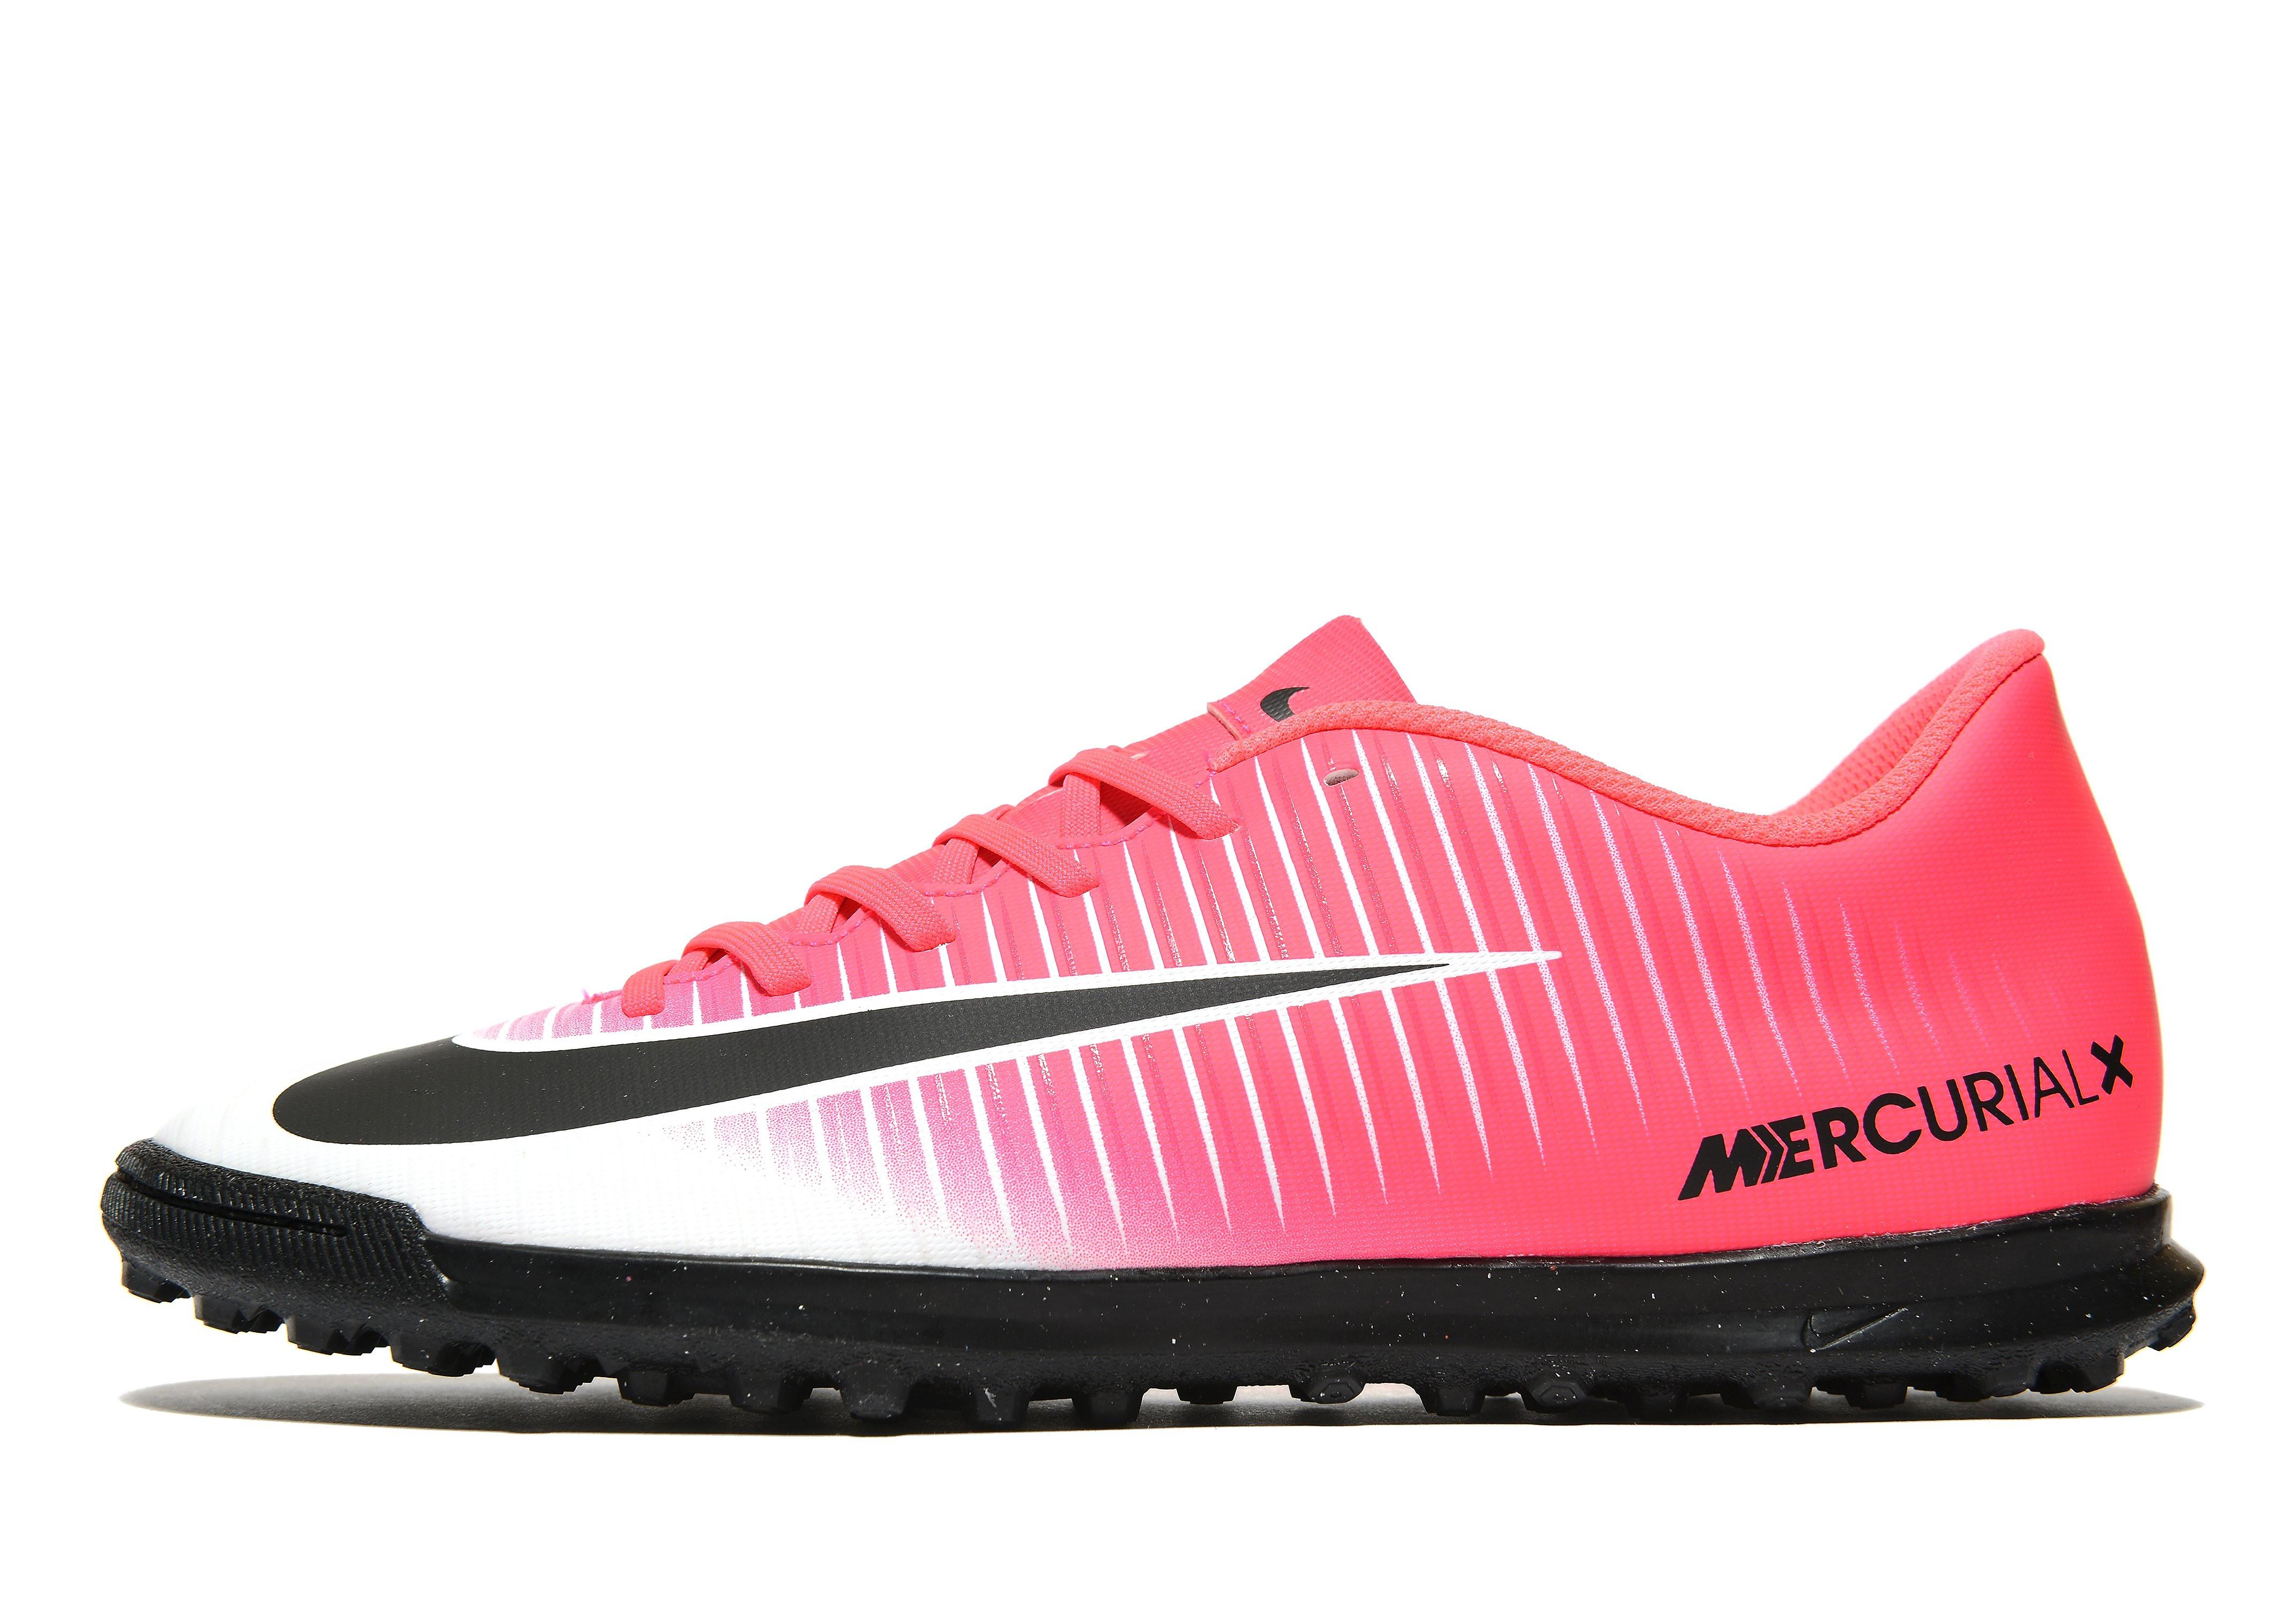 Nike Motion Blur Mercurial Victory VI TF